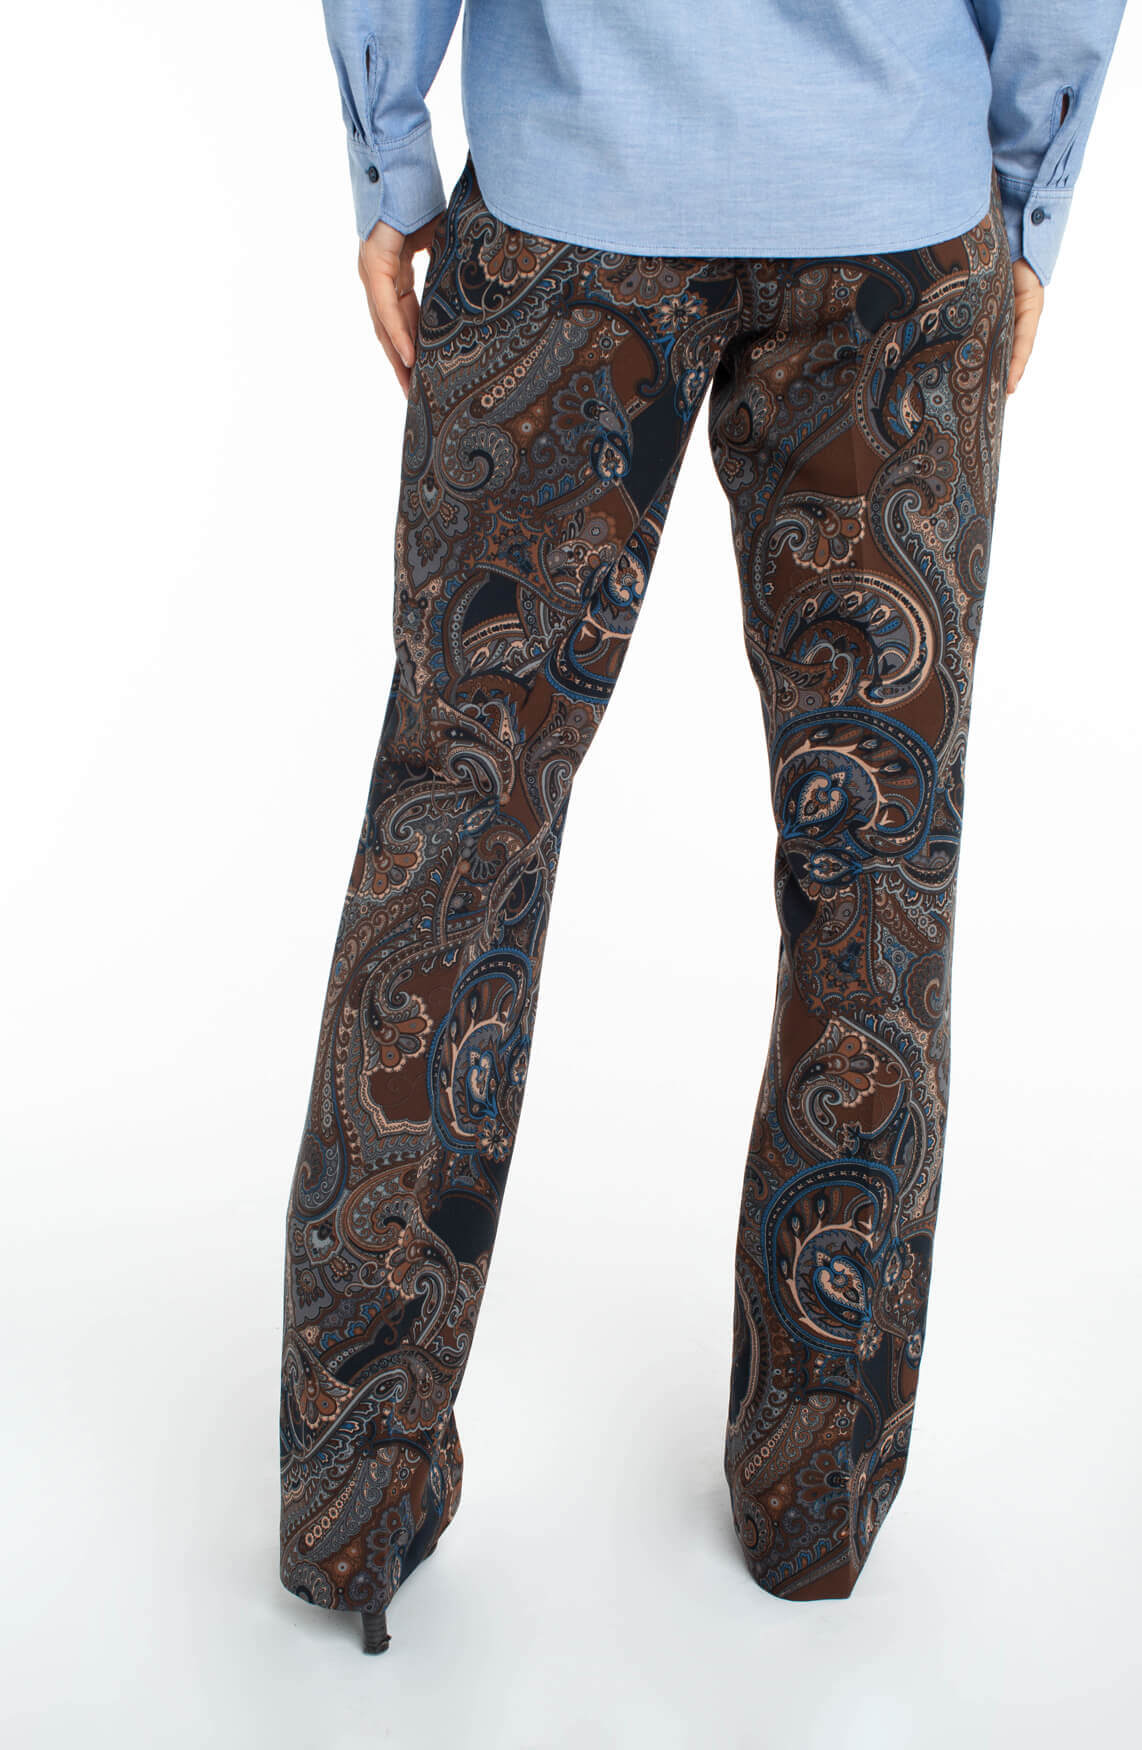 Cambio Dames Ros flared paisley pantalon Bruin